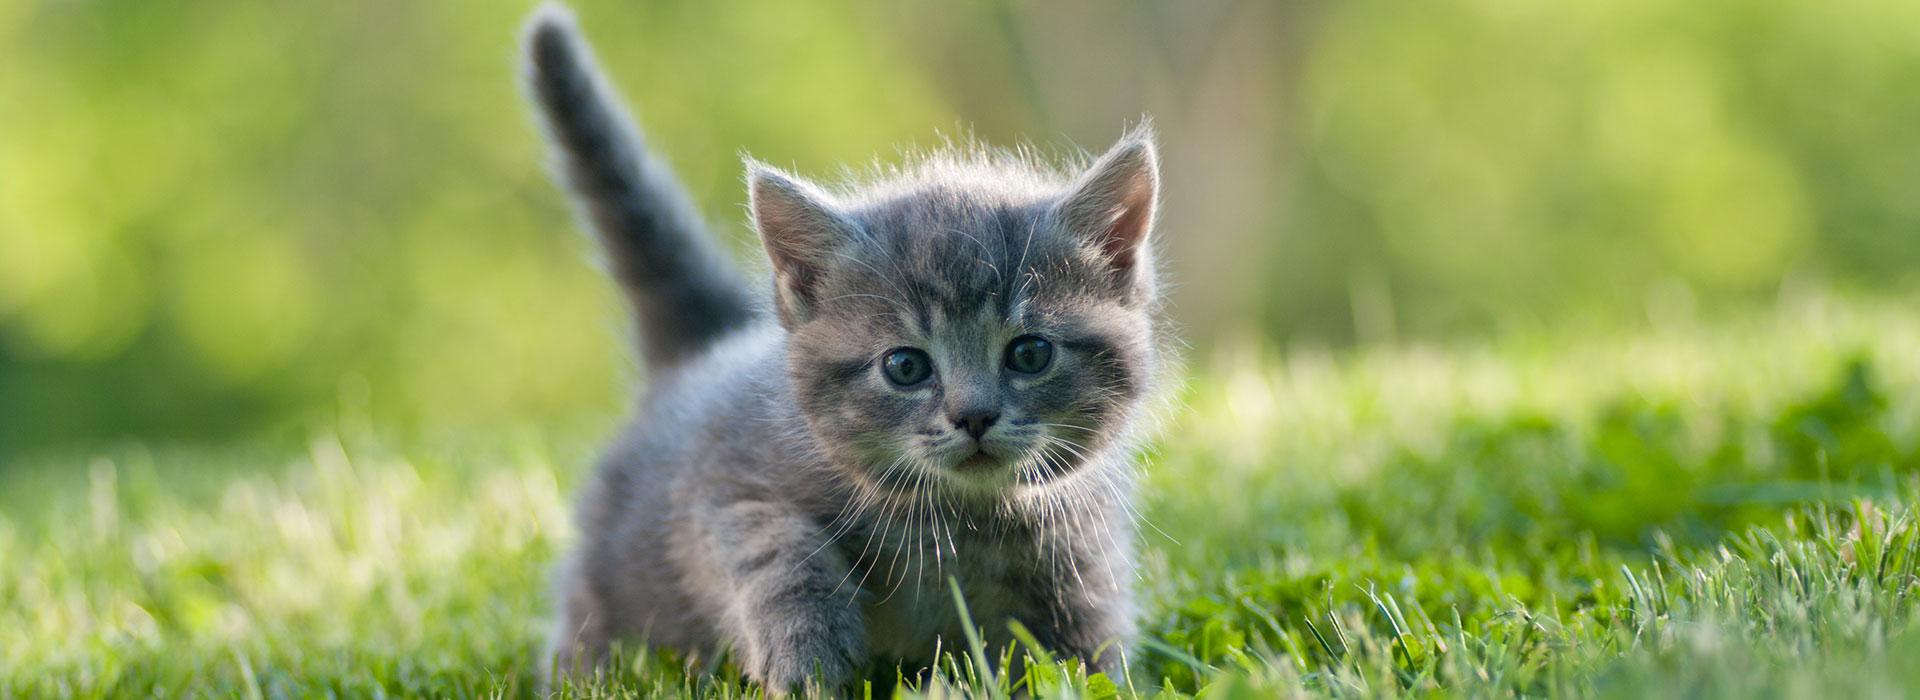 cat straining to urinate or defecate